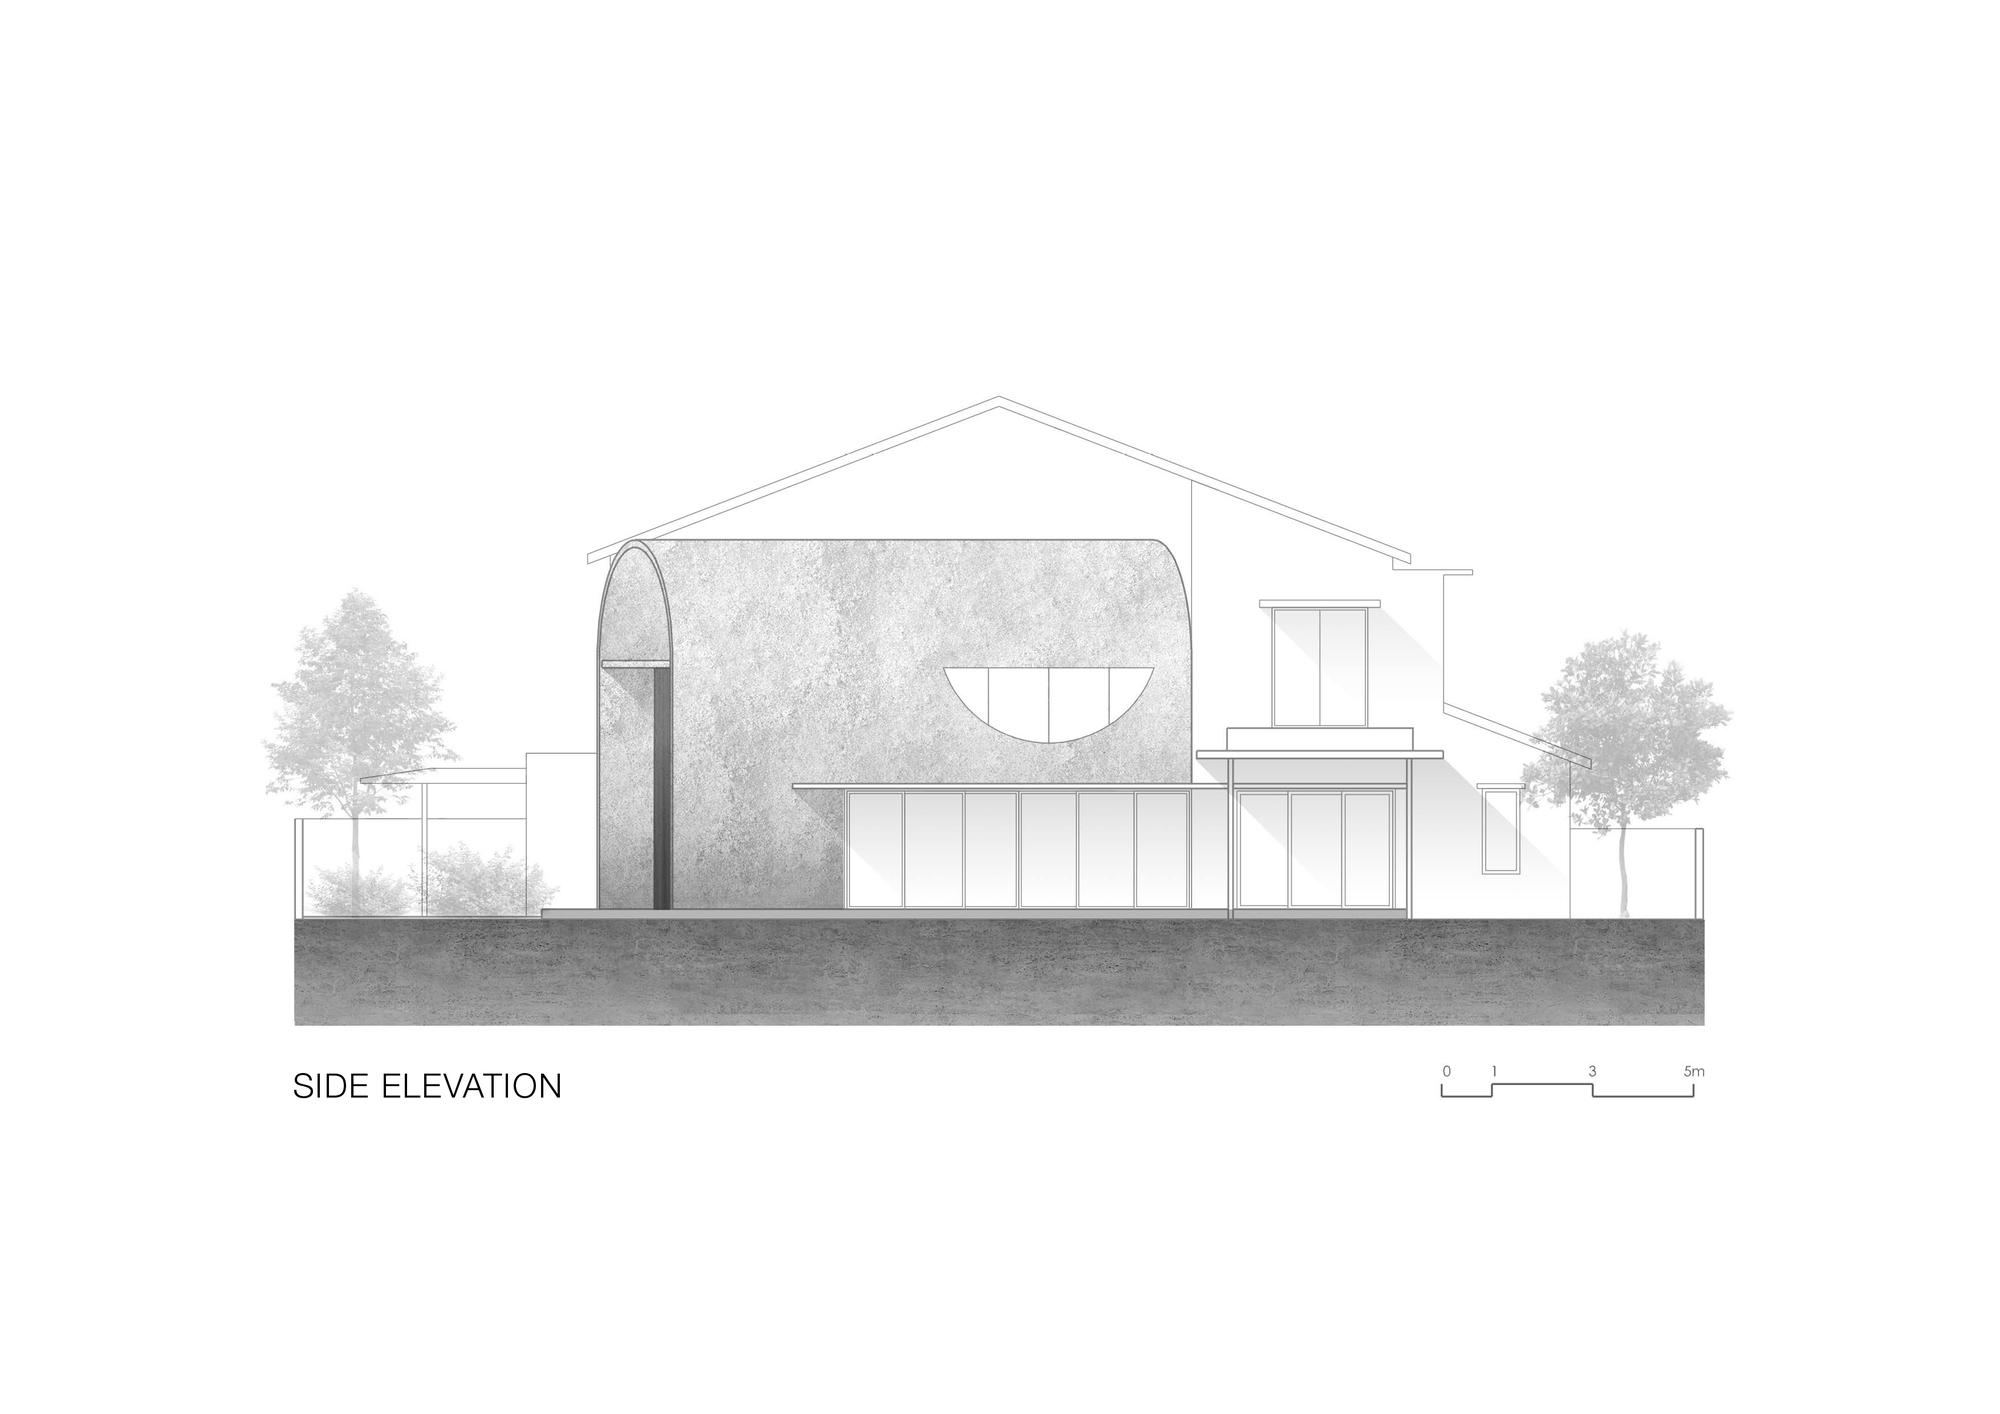 m4 _bewboc_house_drawings_w_legend-3.jpg